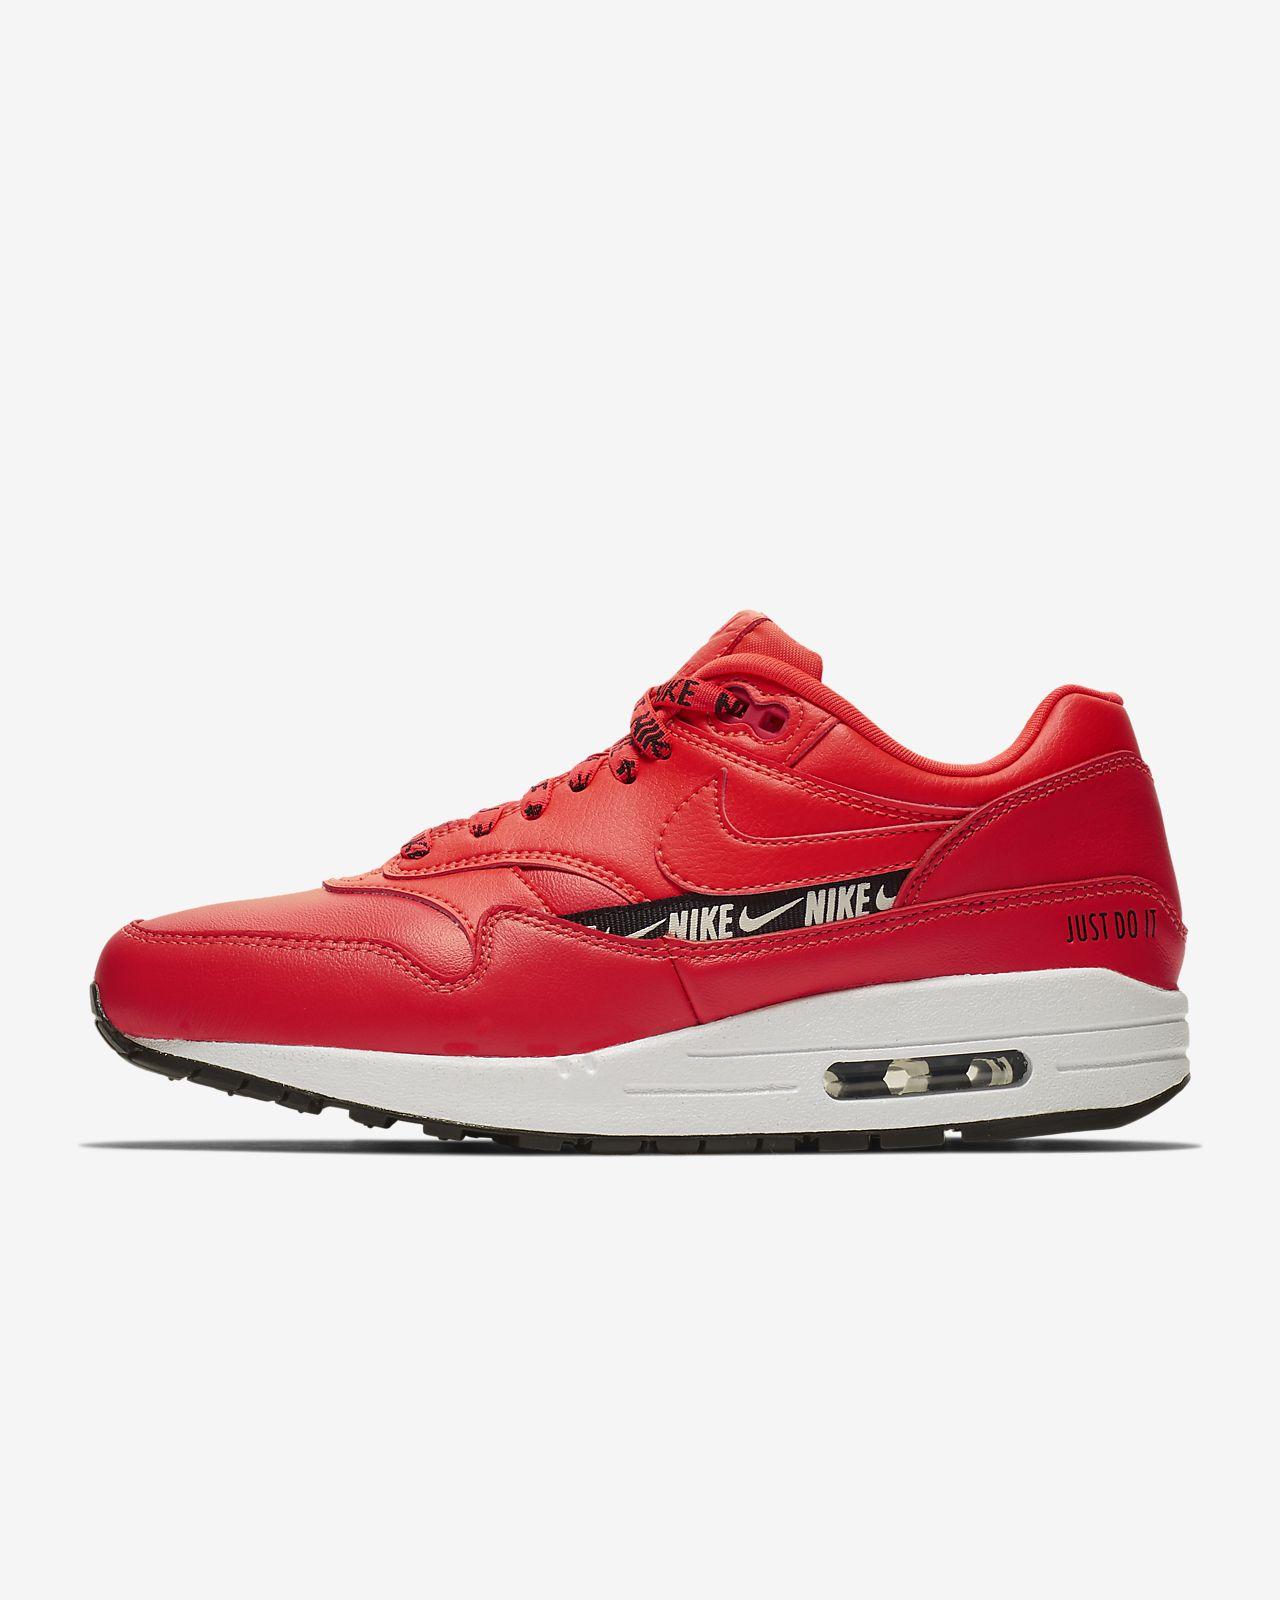 super popular e0168 93622 ... Nike Air Max 1 SE Women s Shoe